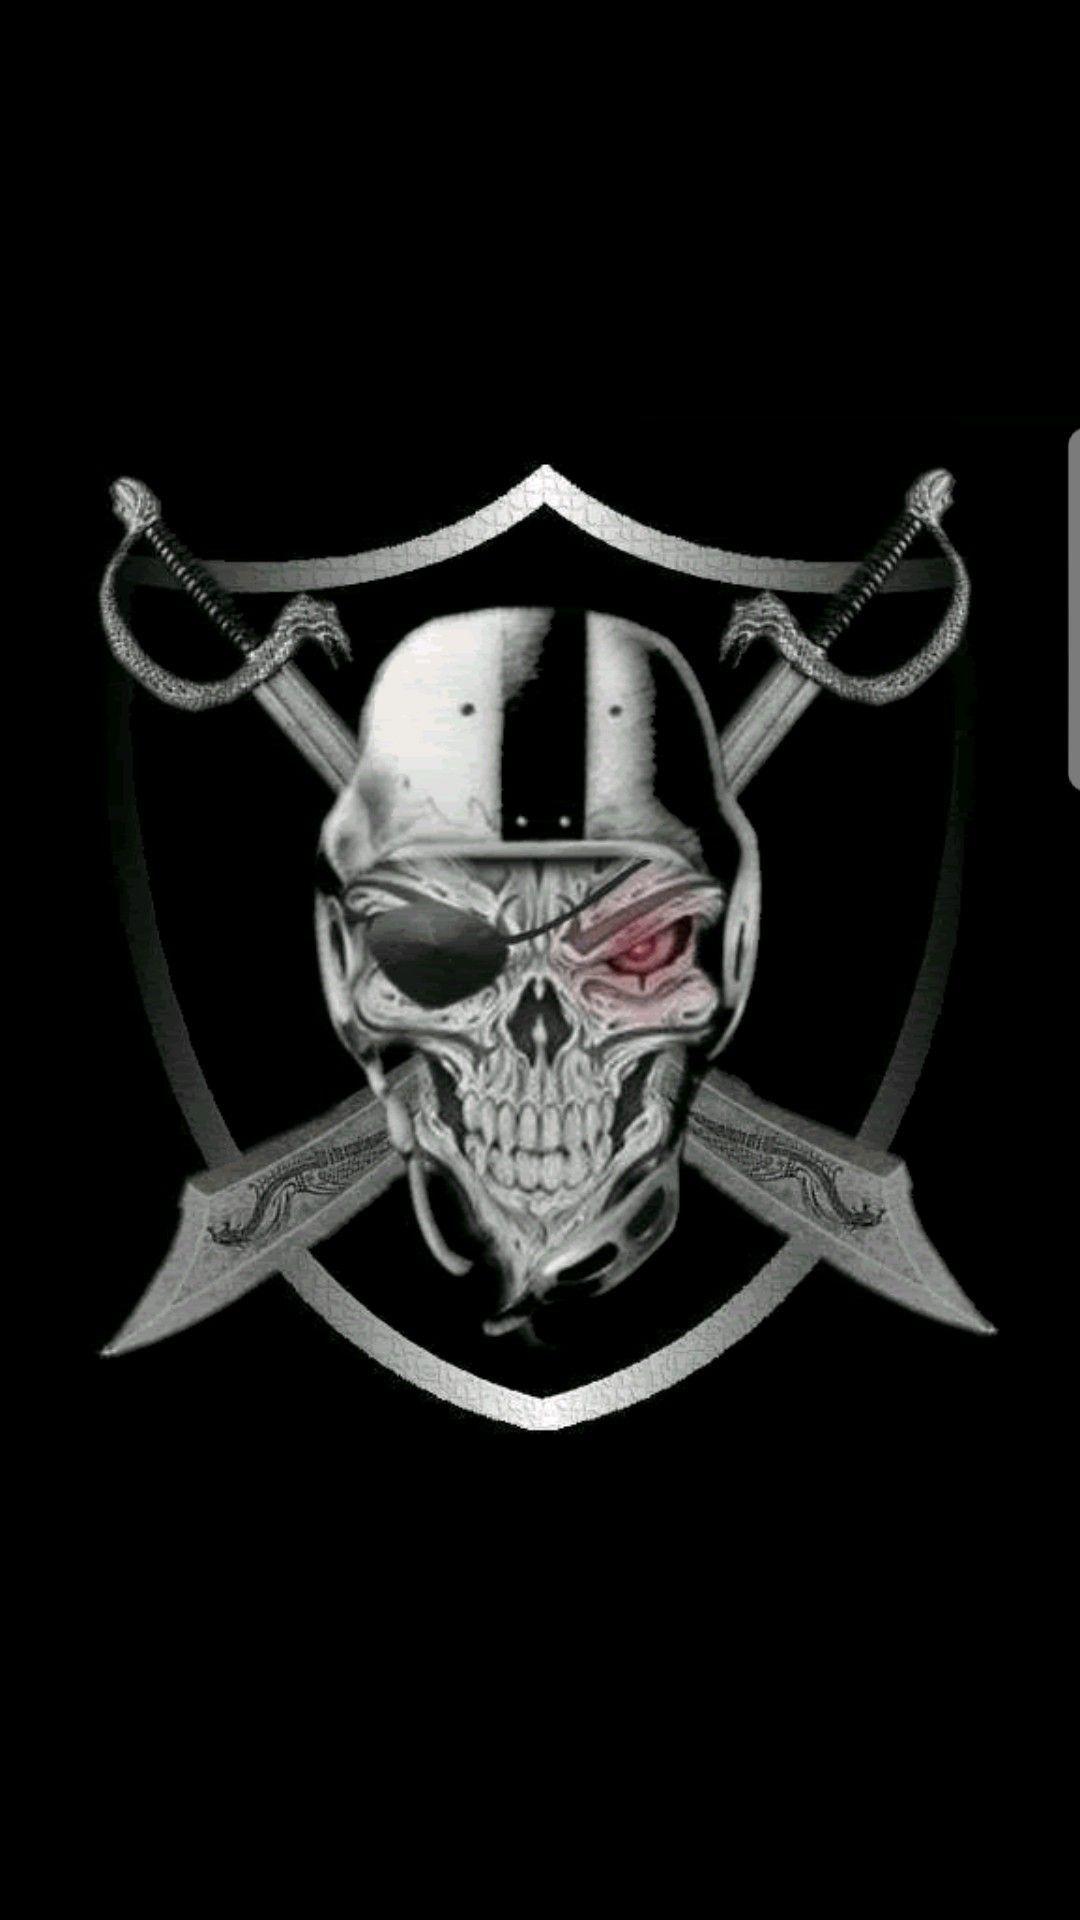 Oakland Raiders Phone Wallpaper In 2020 Raiders Wallpaper Raiders Tattoos Oakland Raiders Logo